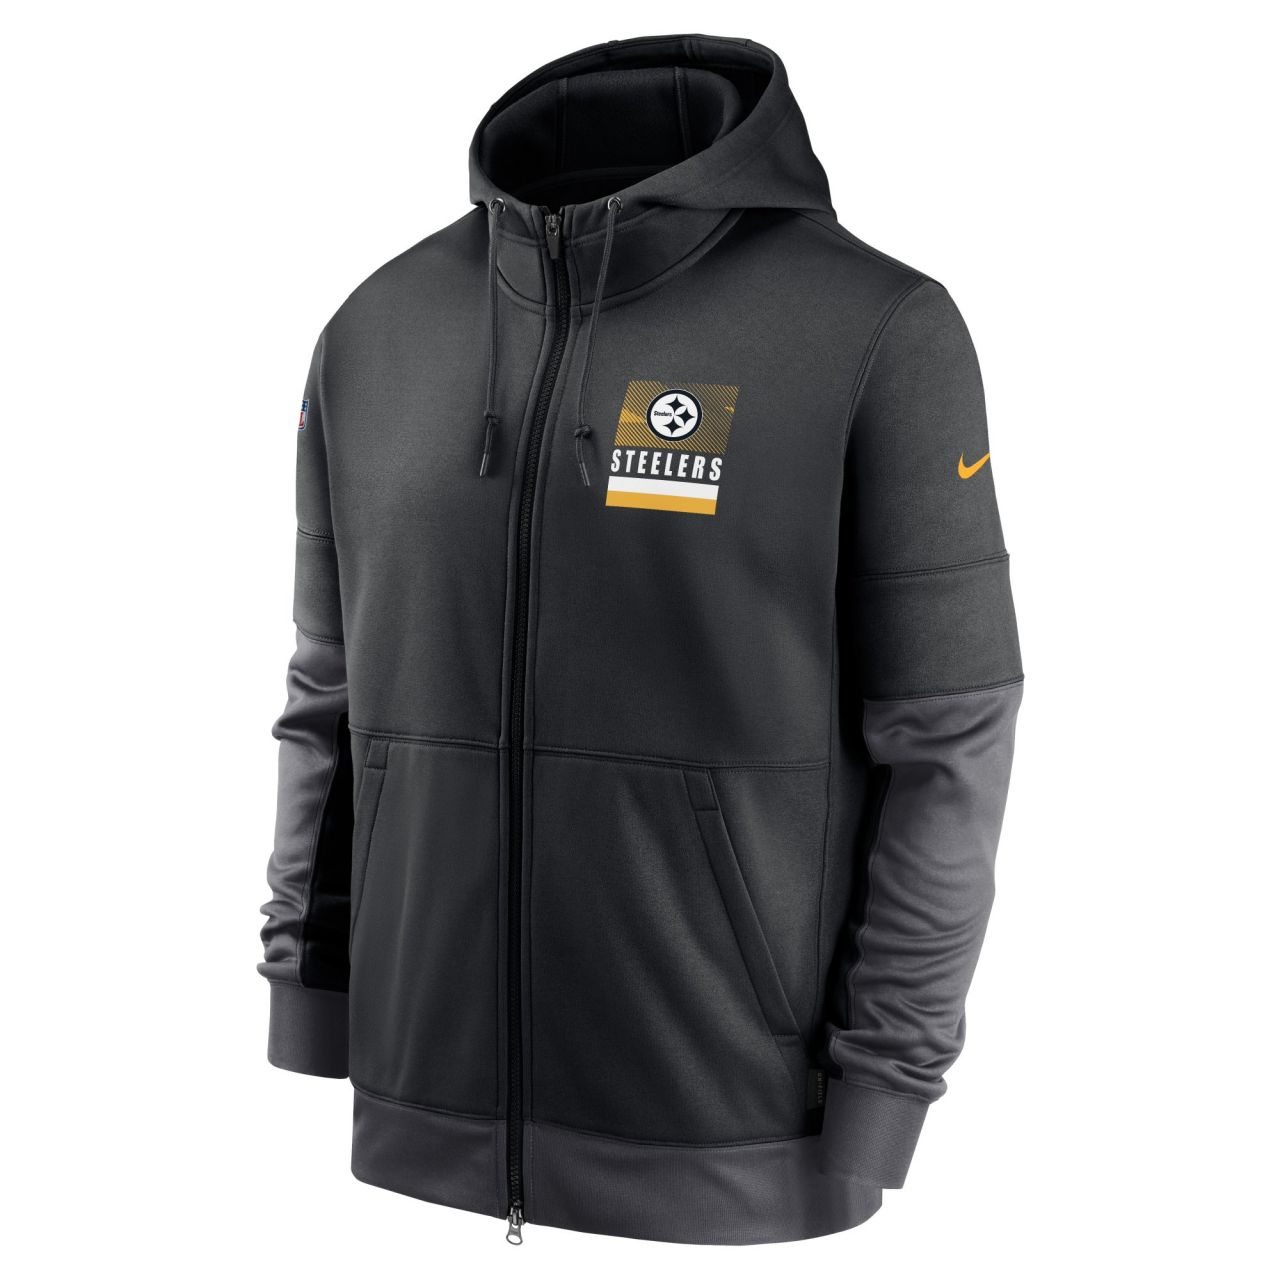 amfoo - Nike NFL Therma Zip Hoody - SIDELINE Pittsburgh Steelers